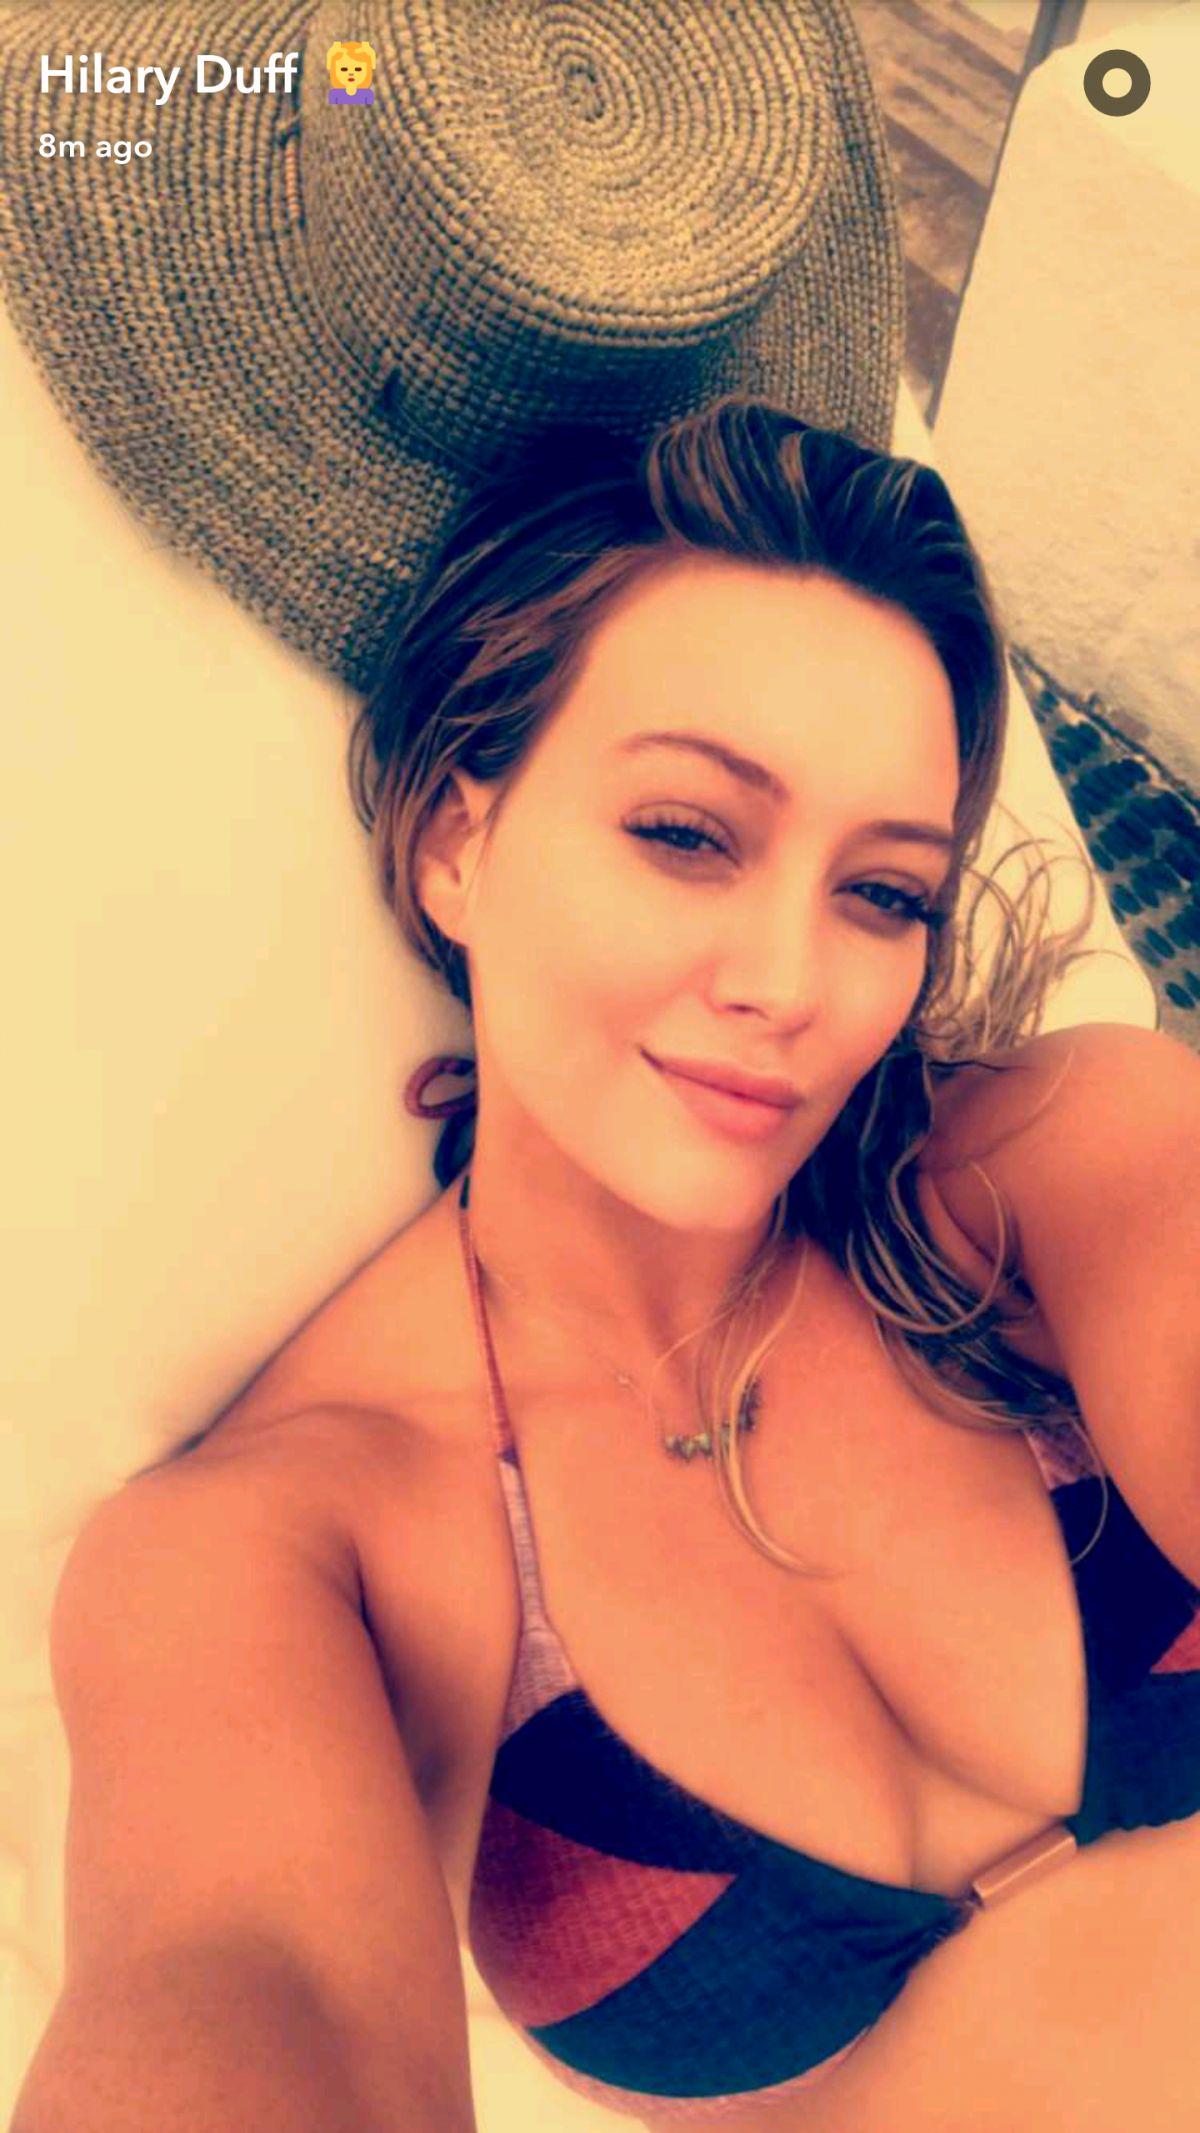 Ass Snapchat Hilary Duff naked photo 2017